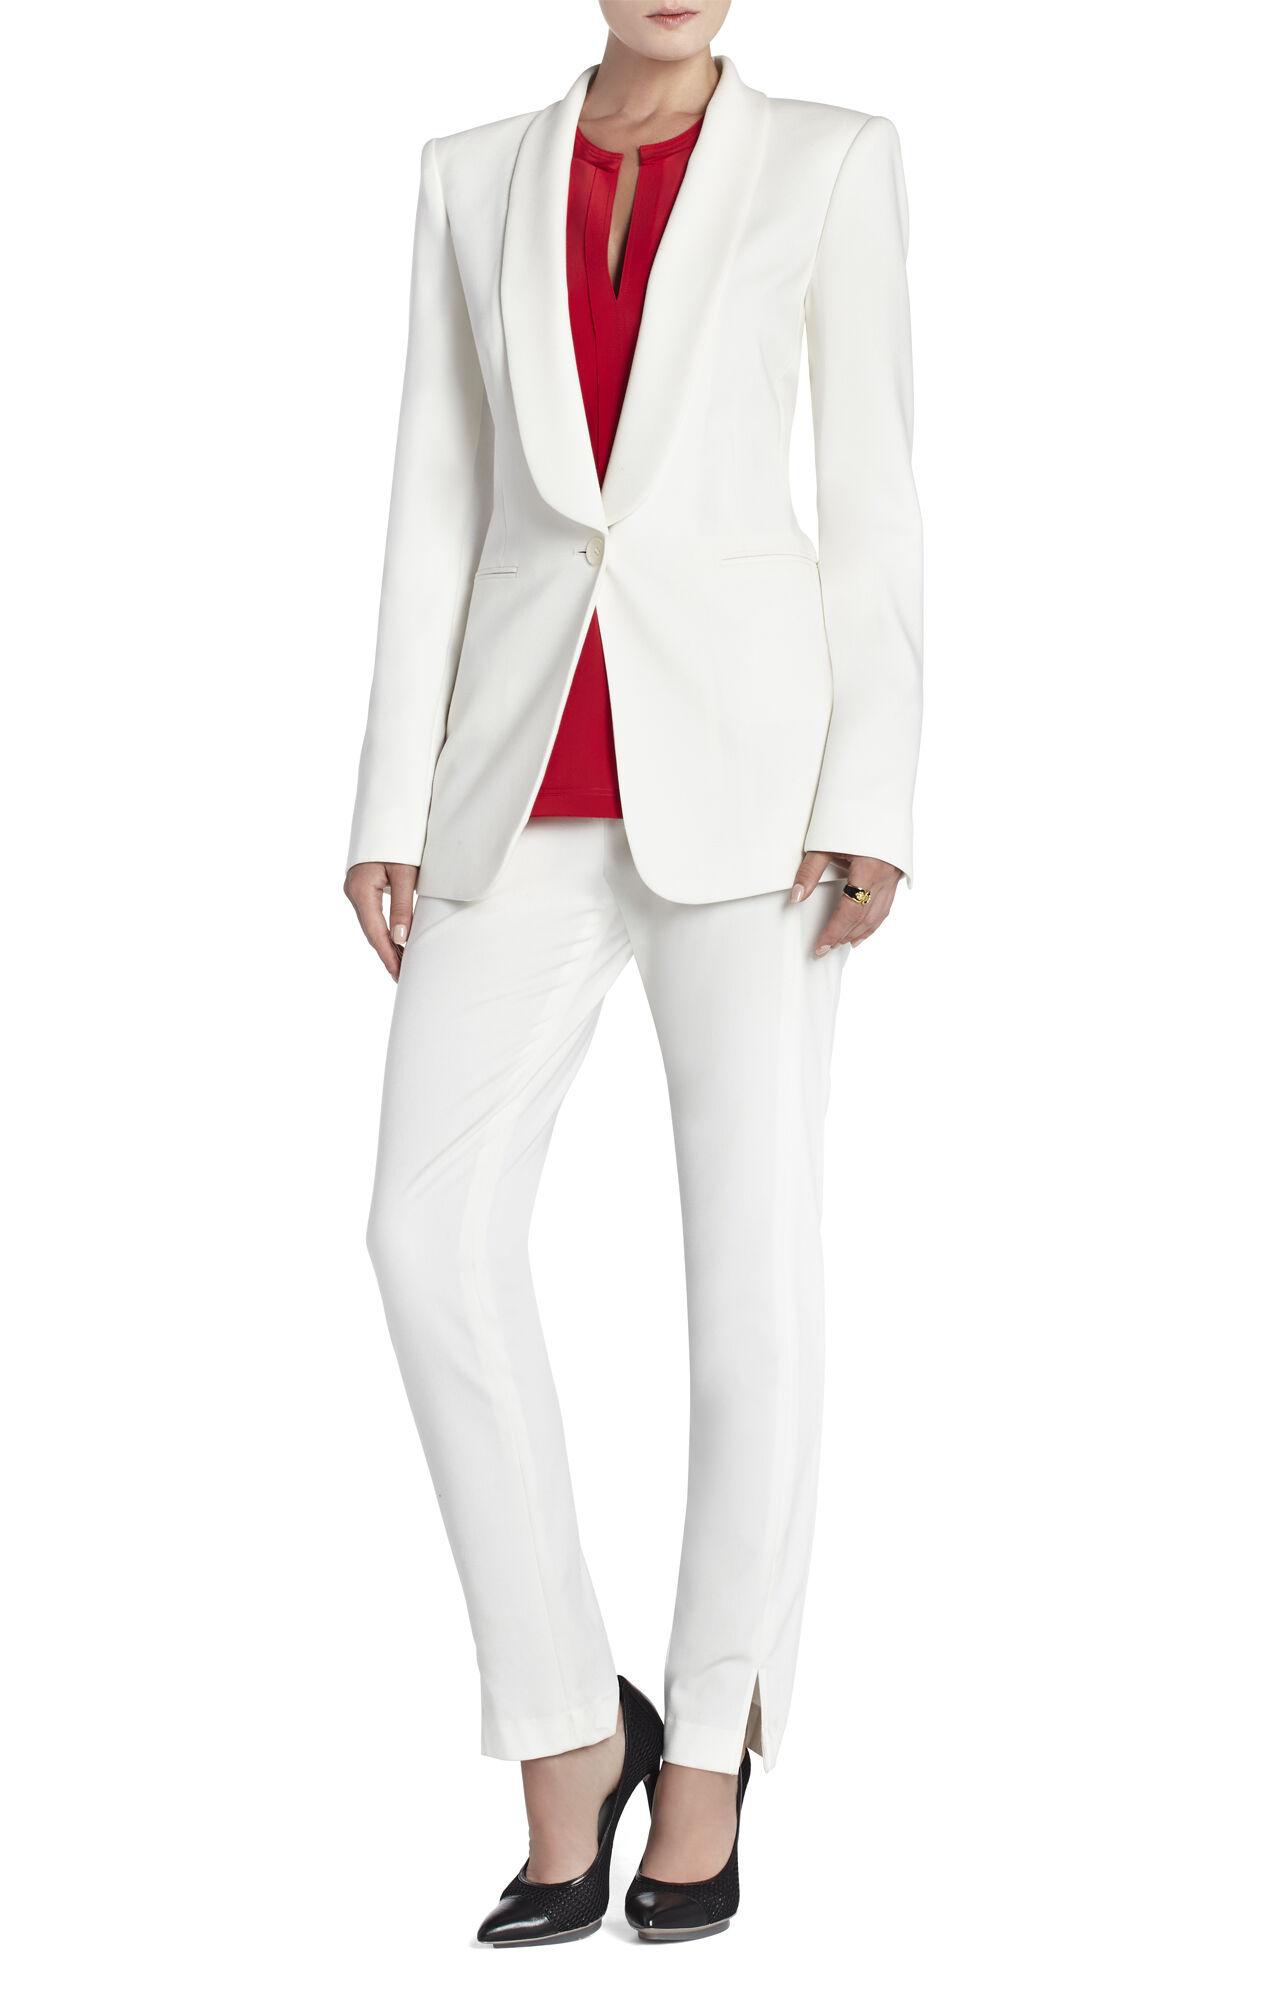 Roslin Shawl-Collar Tuxedo Jacket